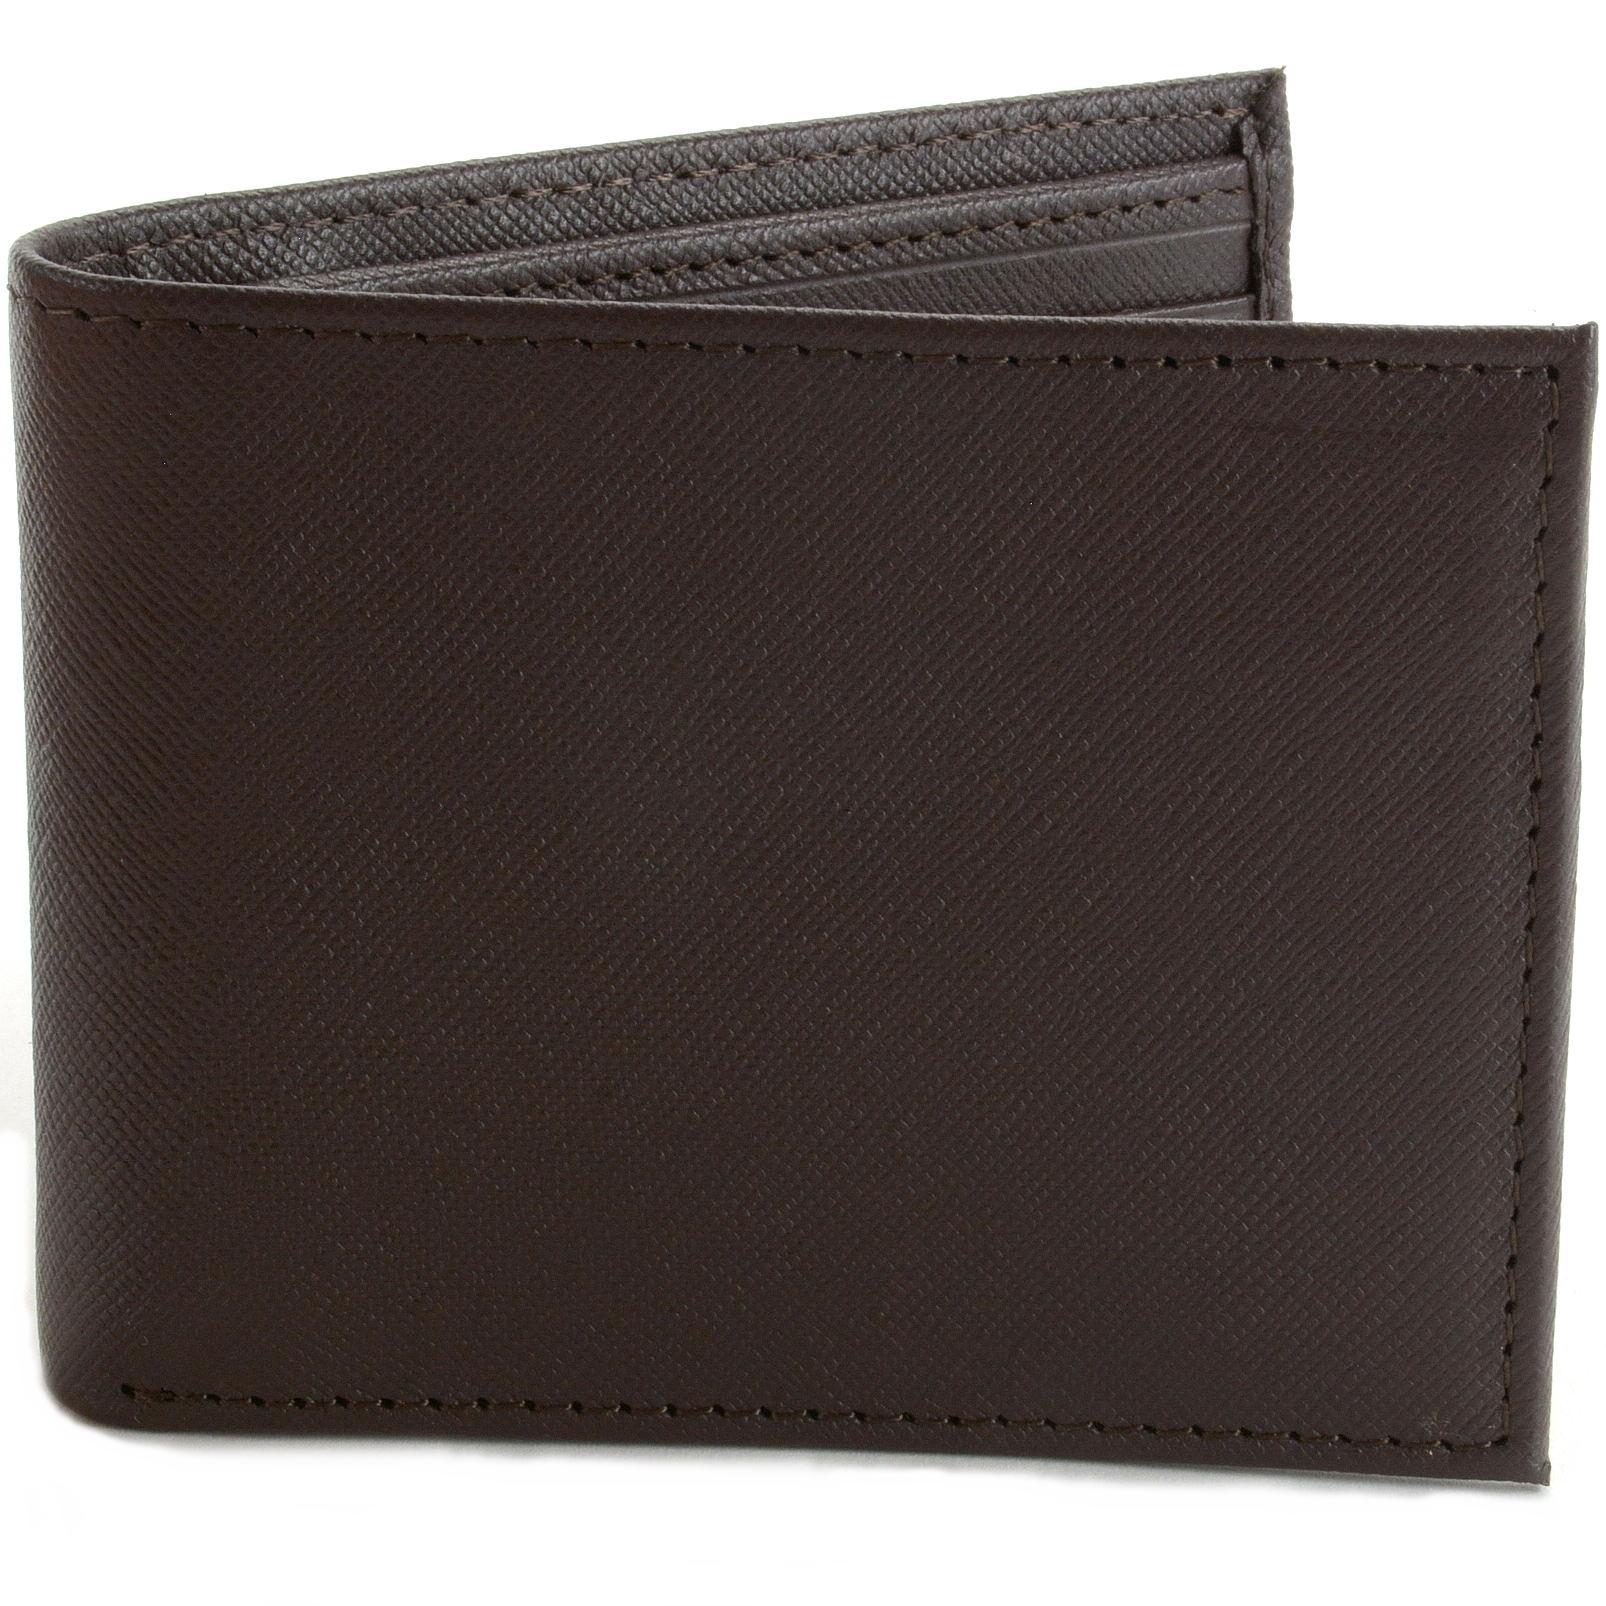 Mens Leather Wallet RFID Blocking Compact Multi Card Flip ID Bifold Hammer Anvil | eBay